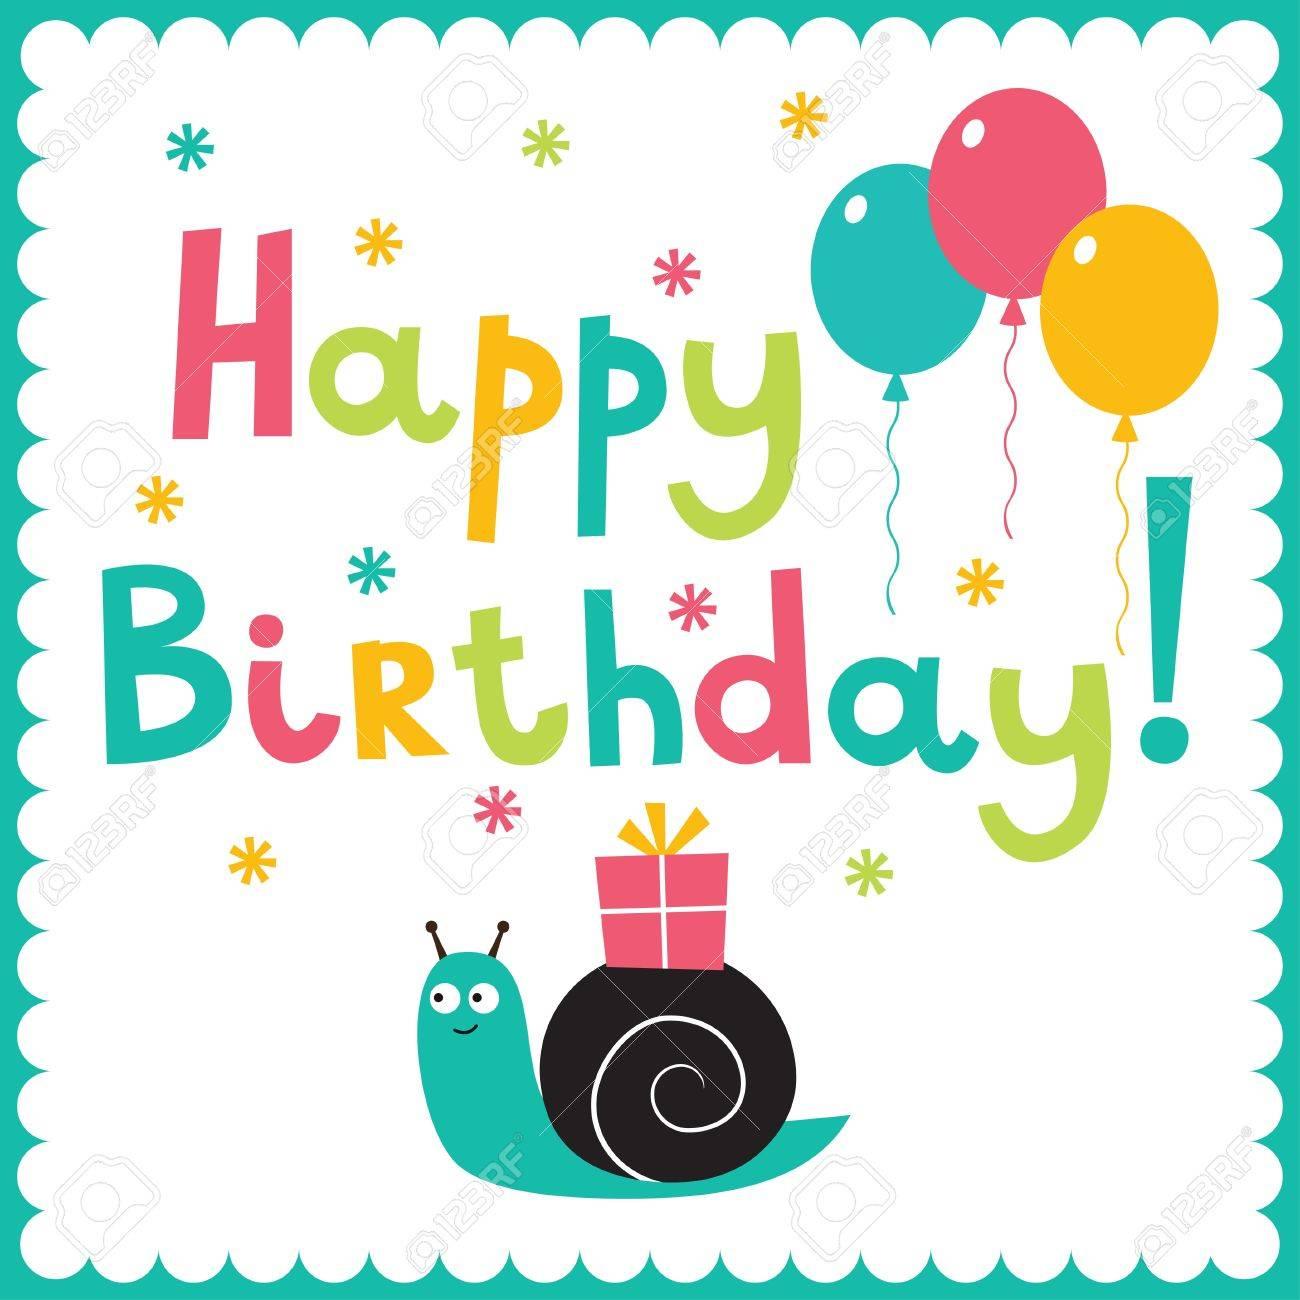 100 Hoops And Yoyo Birthday – Hoops and Yoyo Birthday Card